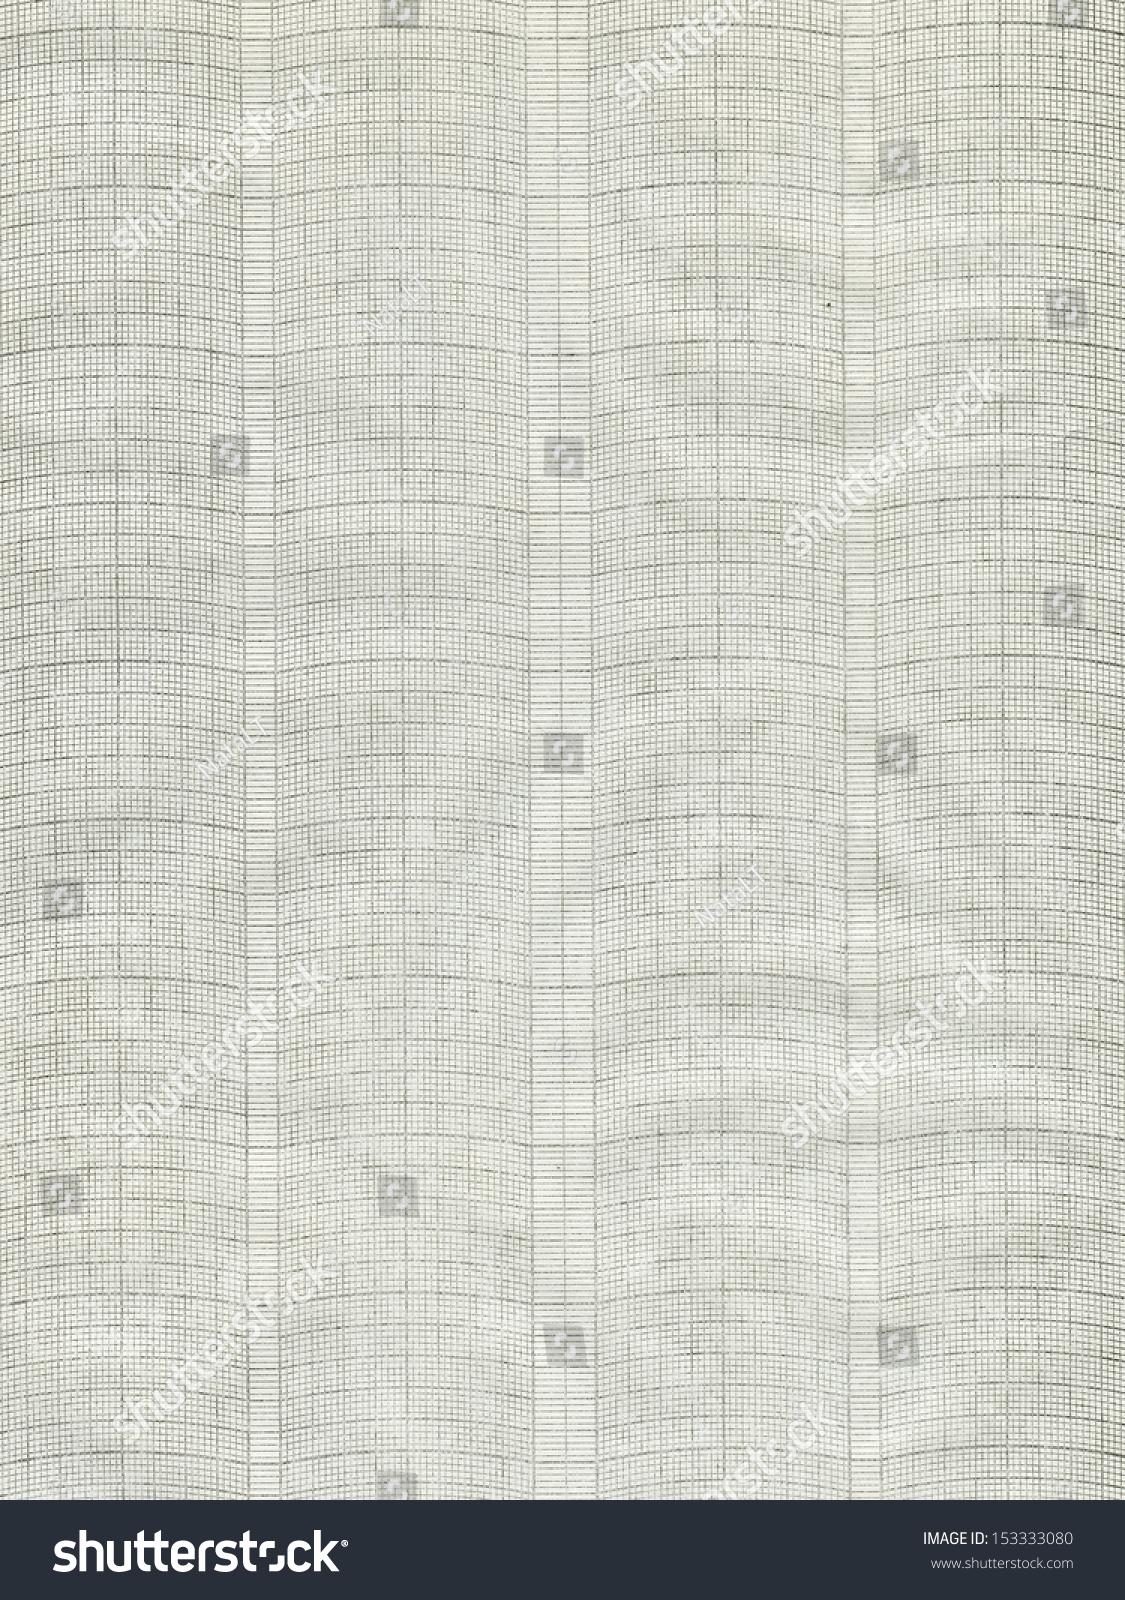 xxl millimeter paper graph paper plotting stock photo